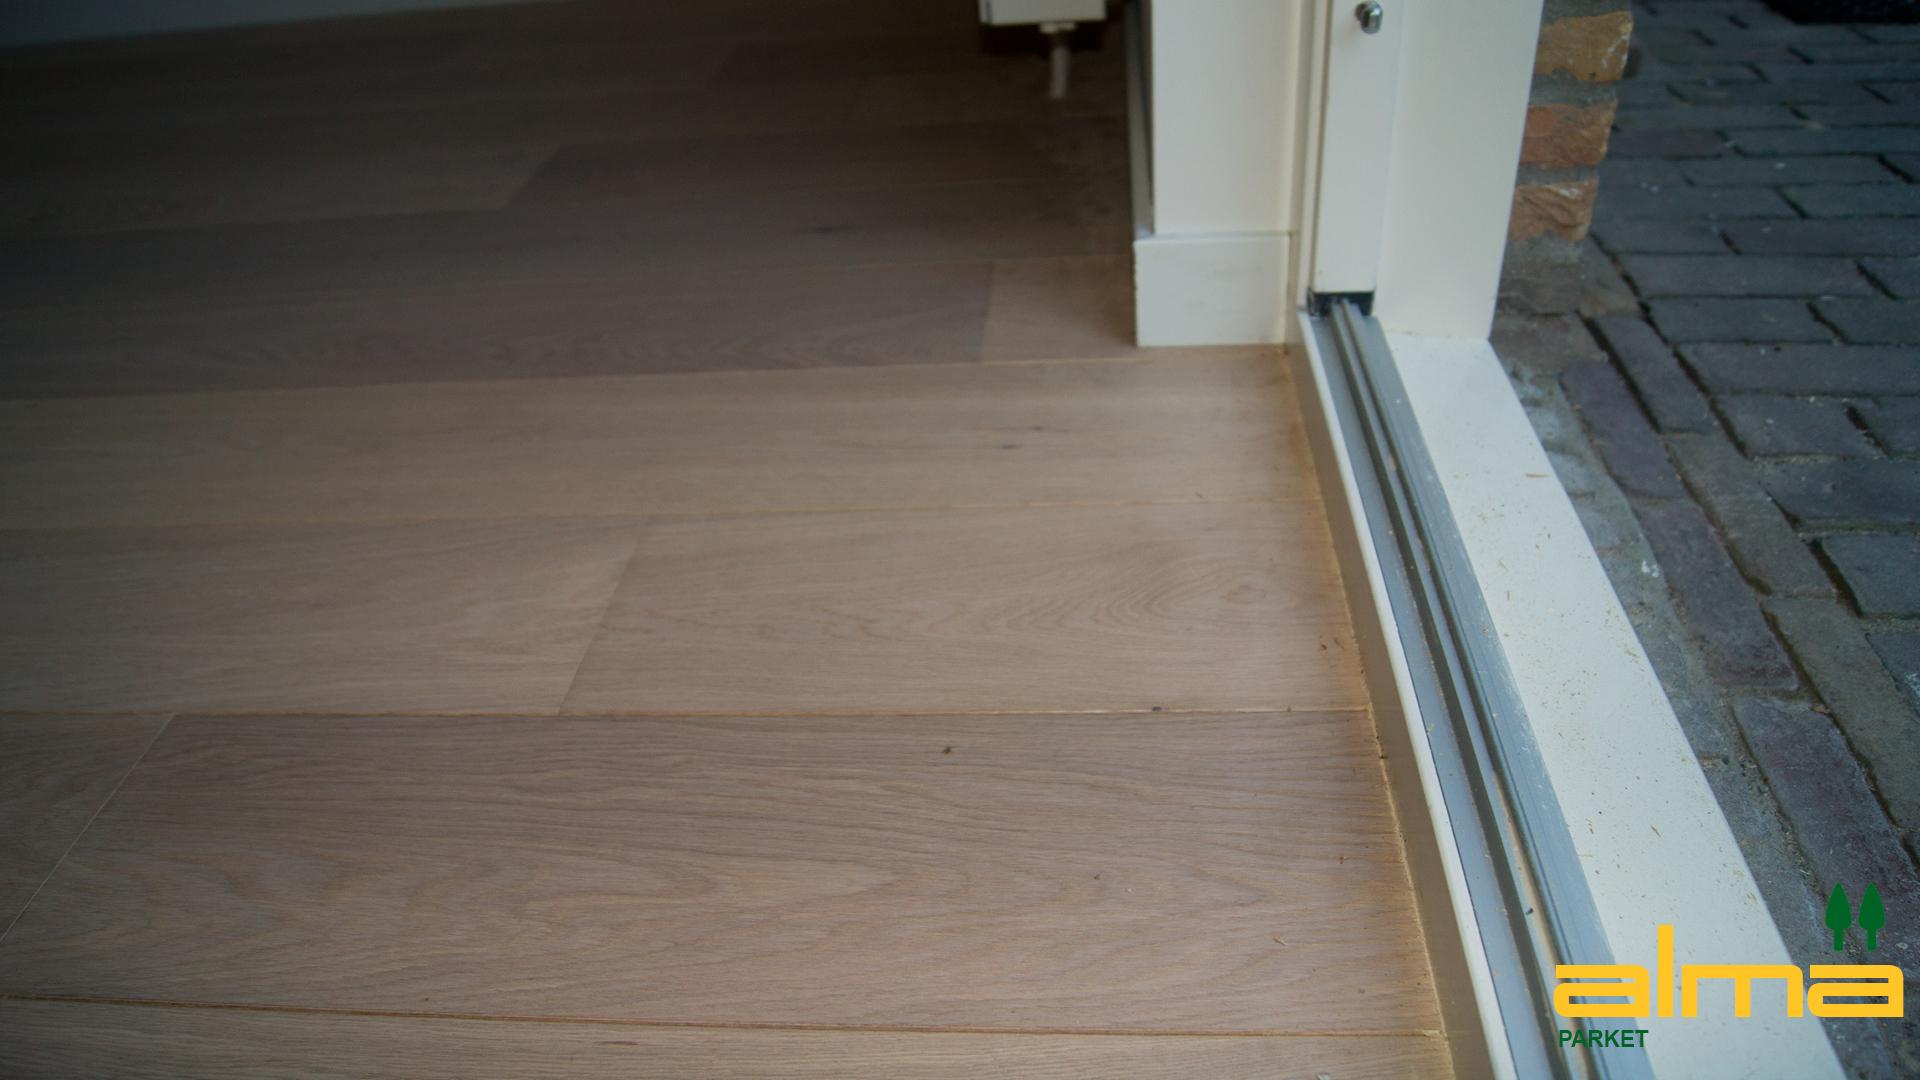 820 detail strak modern aansluiting muur wand vloer parket hout